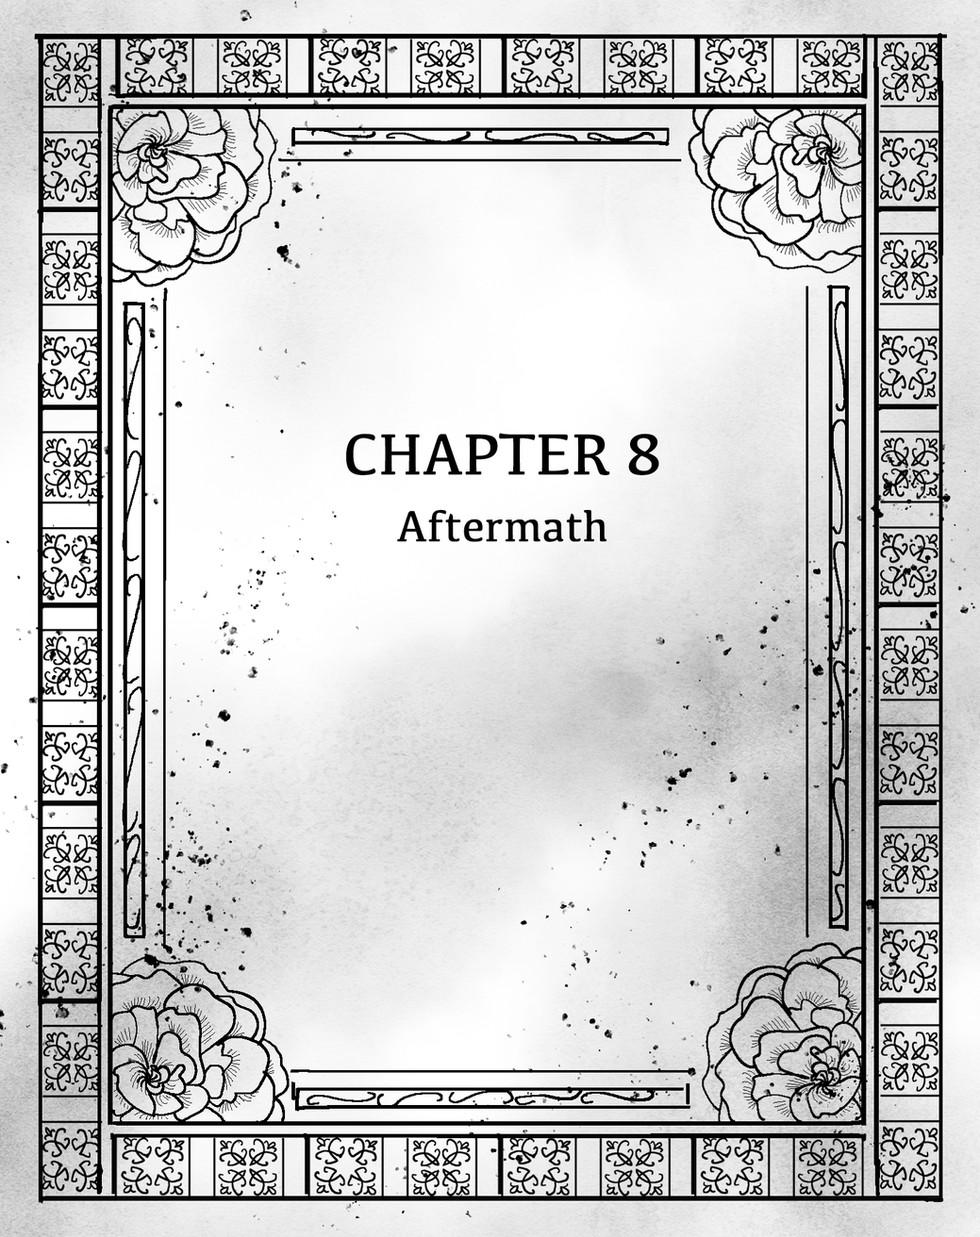 Amnesia_ChapterCard_8.jpg